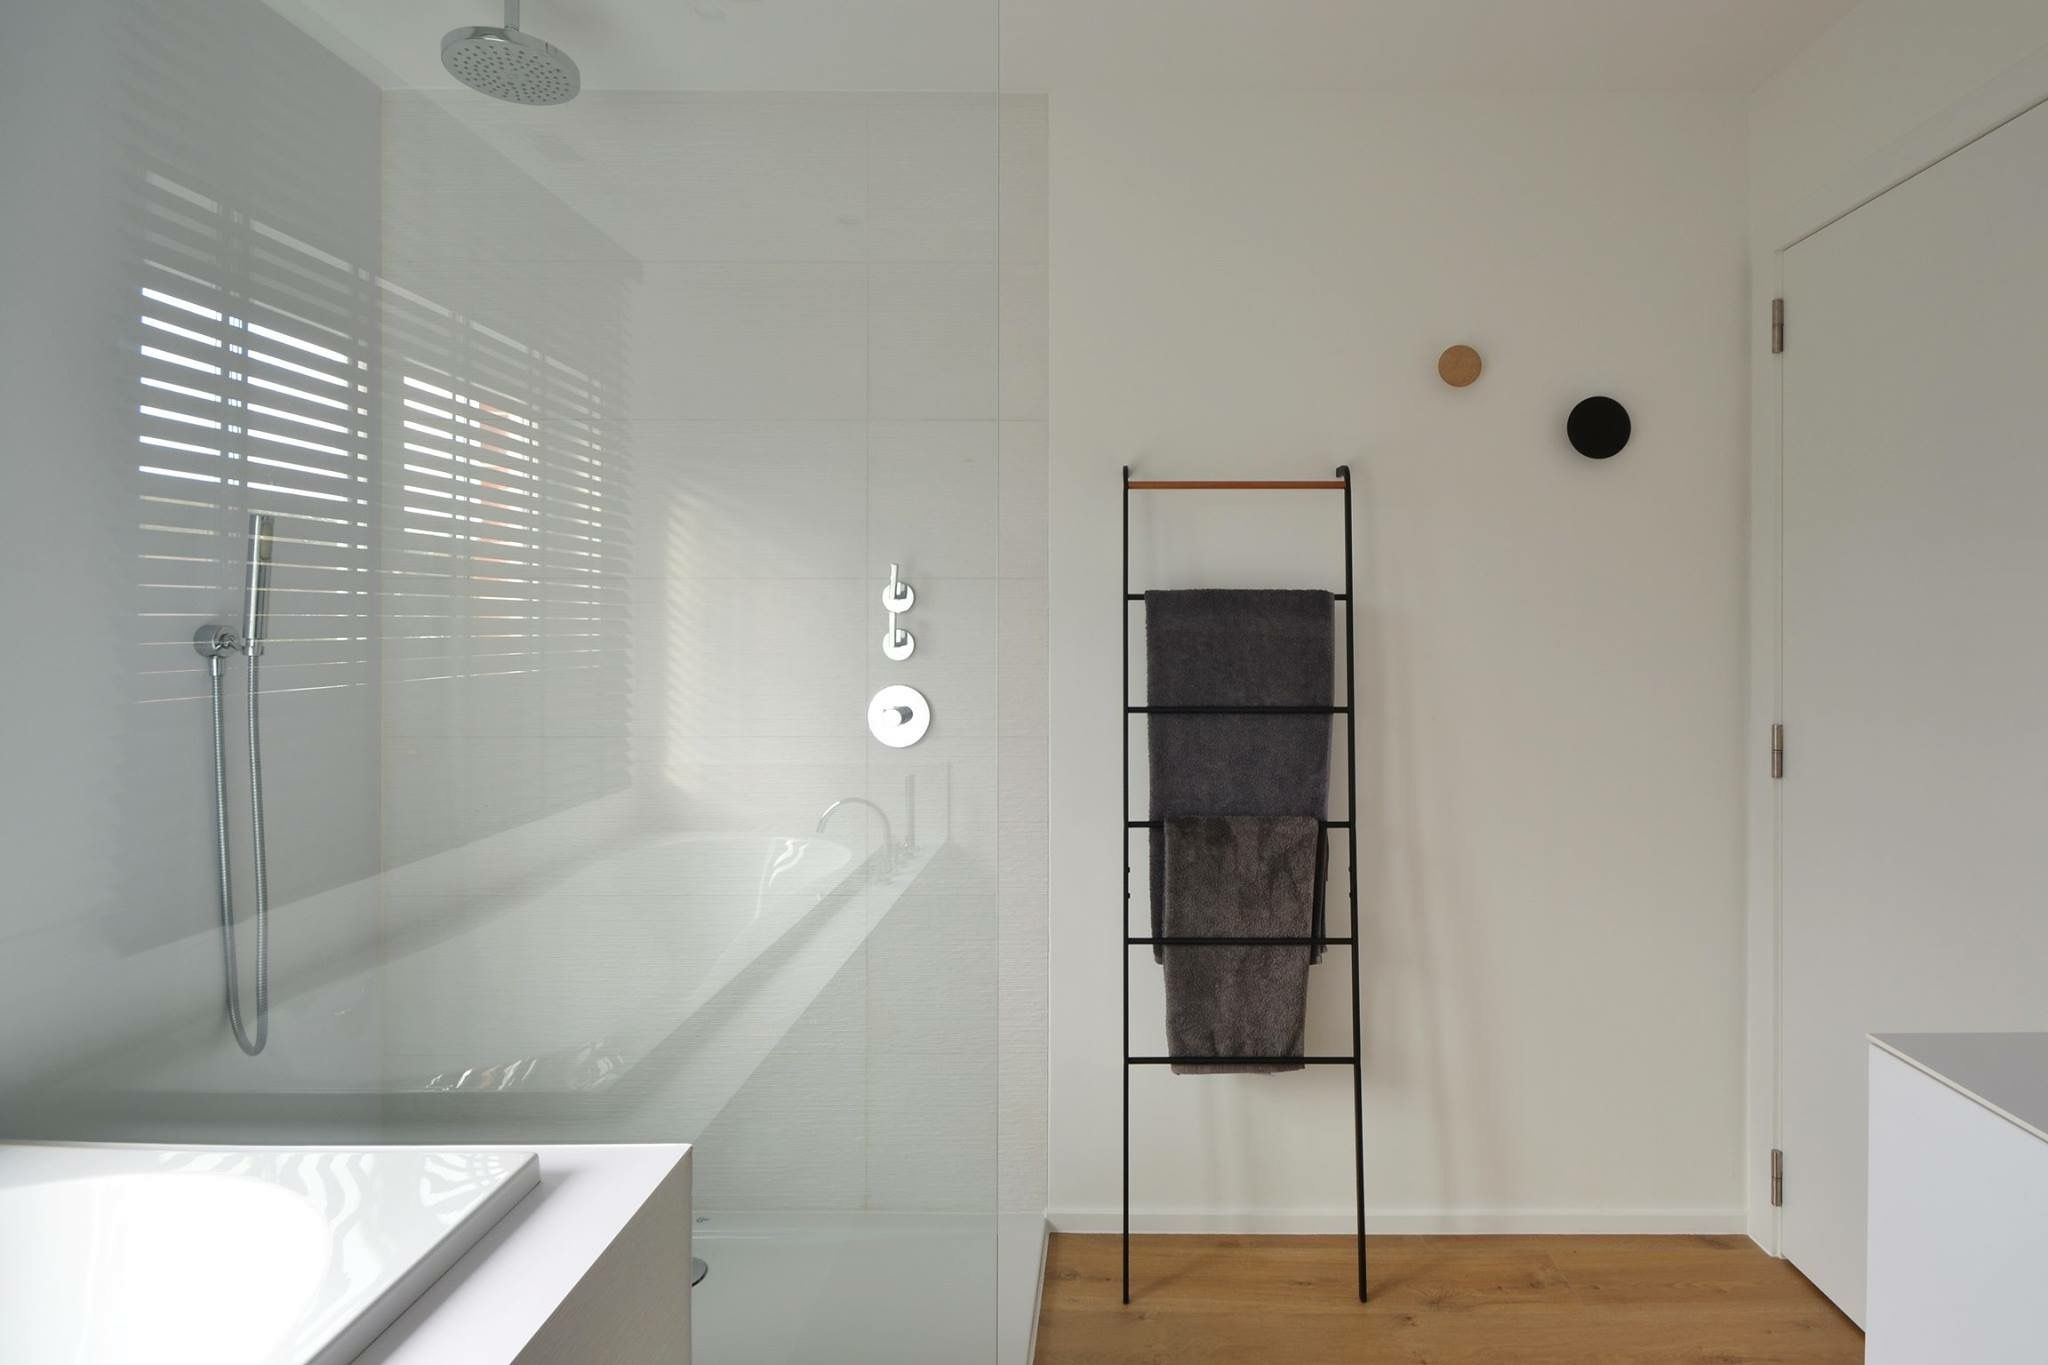 Moderne Witte Badkamer : Moderne witte badkamer met zwarte accenten bathroom